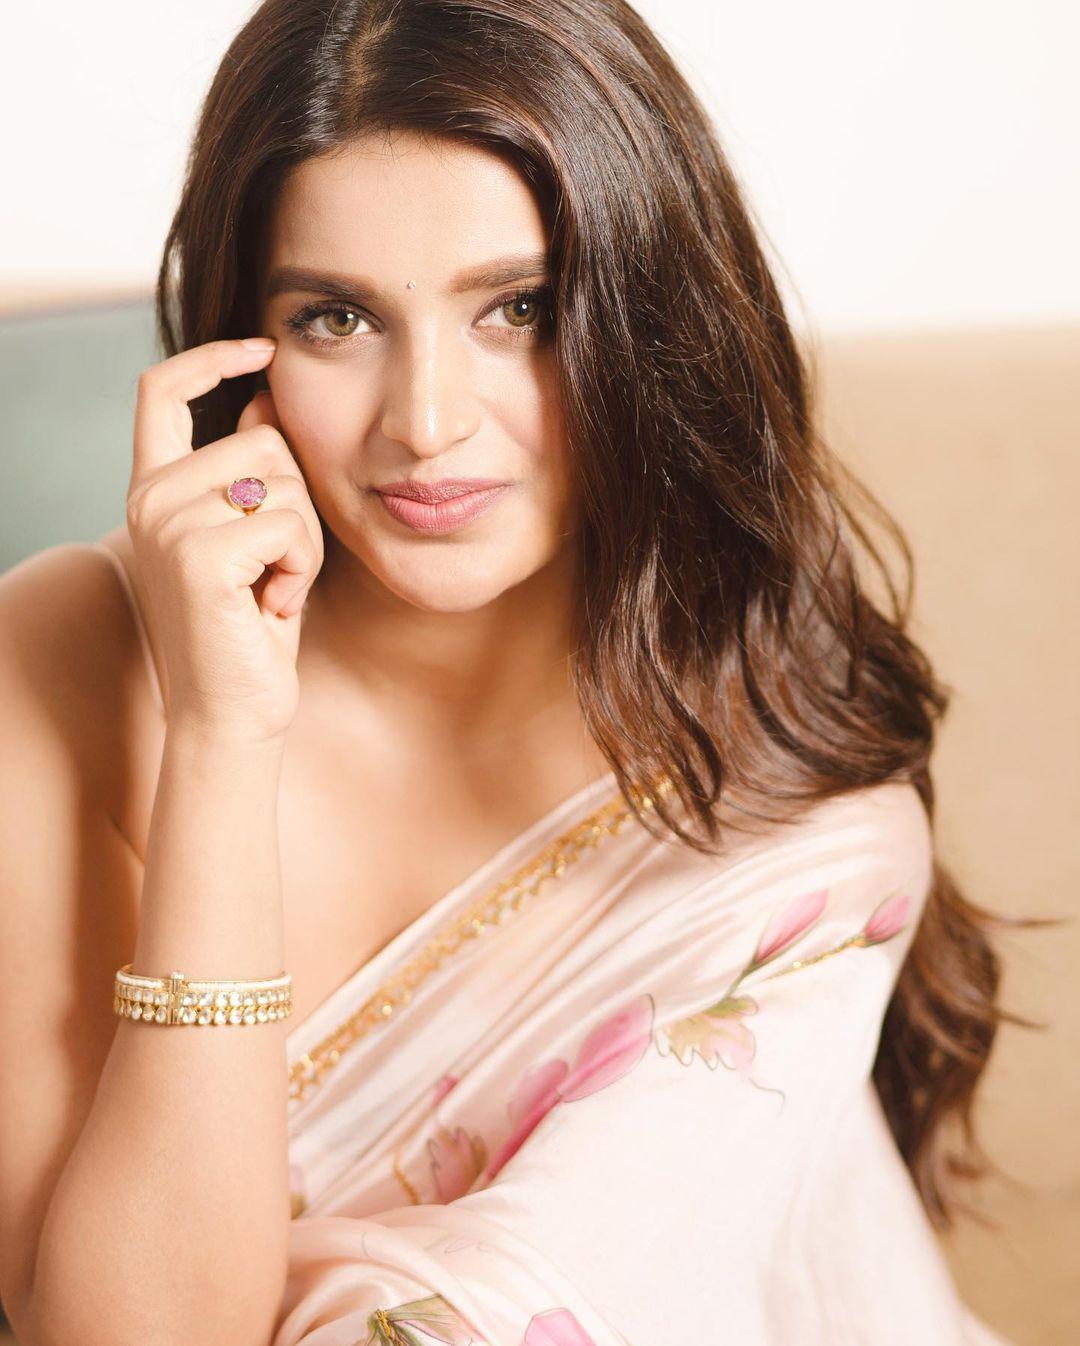 Watch: Nidhhi Agerwals Hot & Seductive Moves In Aaj Jaane